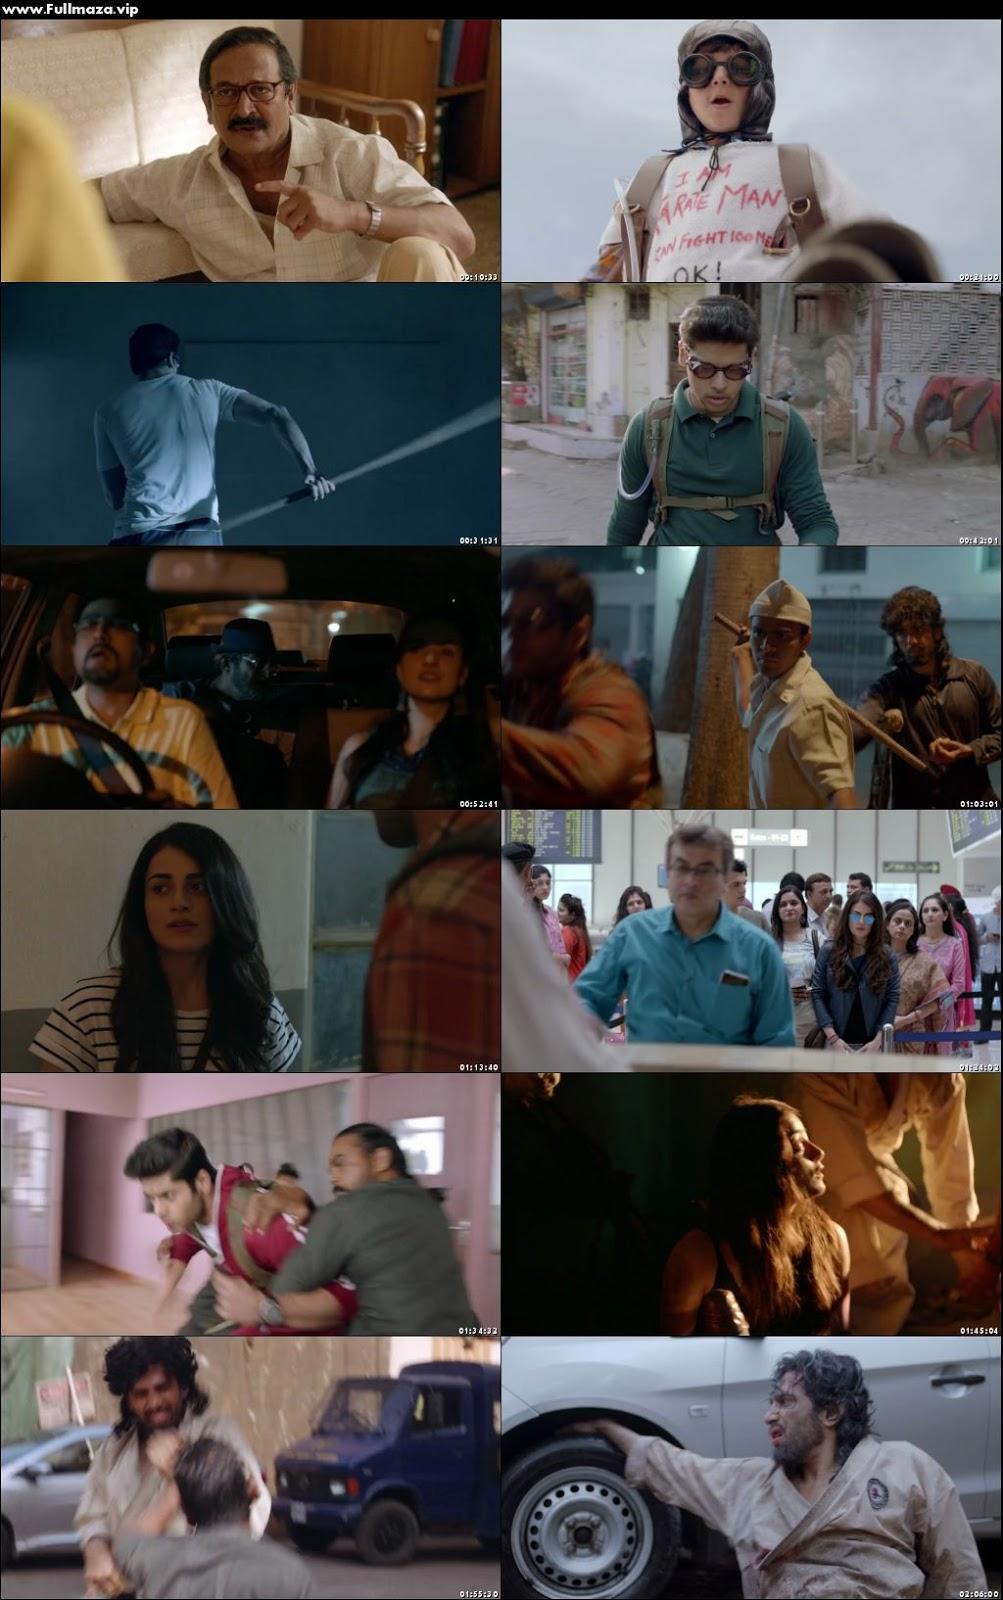 New Hindi Movei 2018 2019 Bolliwood: Mard Ko Dard Nahin Hota (2018) Hindi Movie 720p HDRip X264